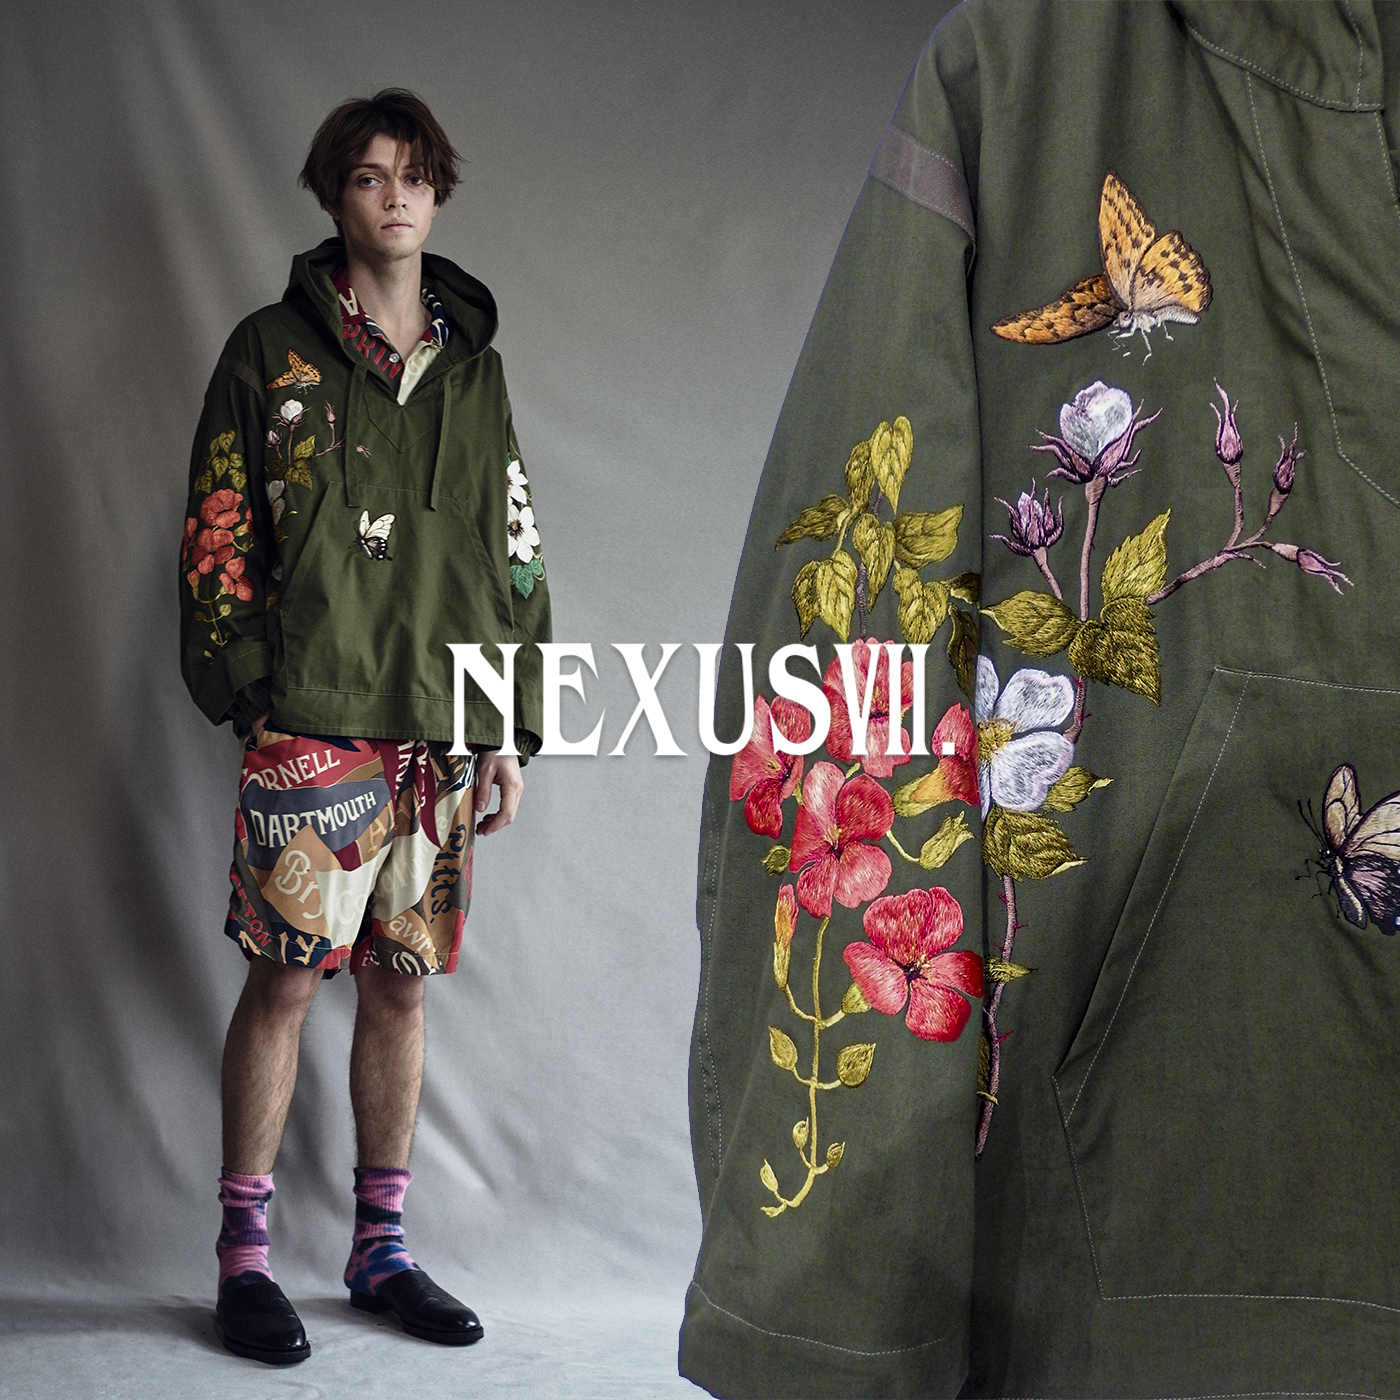 nexusvii,nexusvii 今野,ネクサスセブン,今野智弘,MULTIPLE MANIAXX & TECHNIXX,